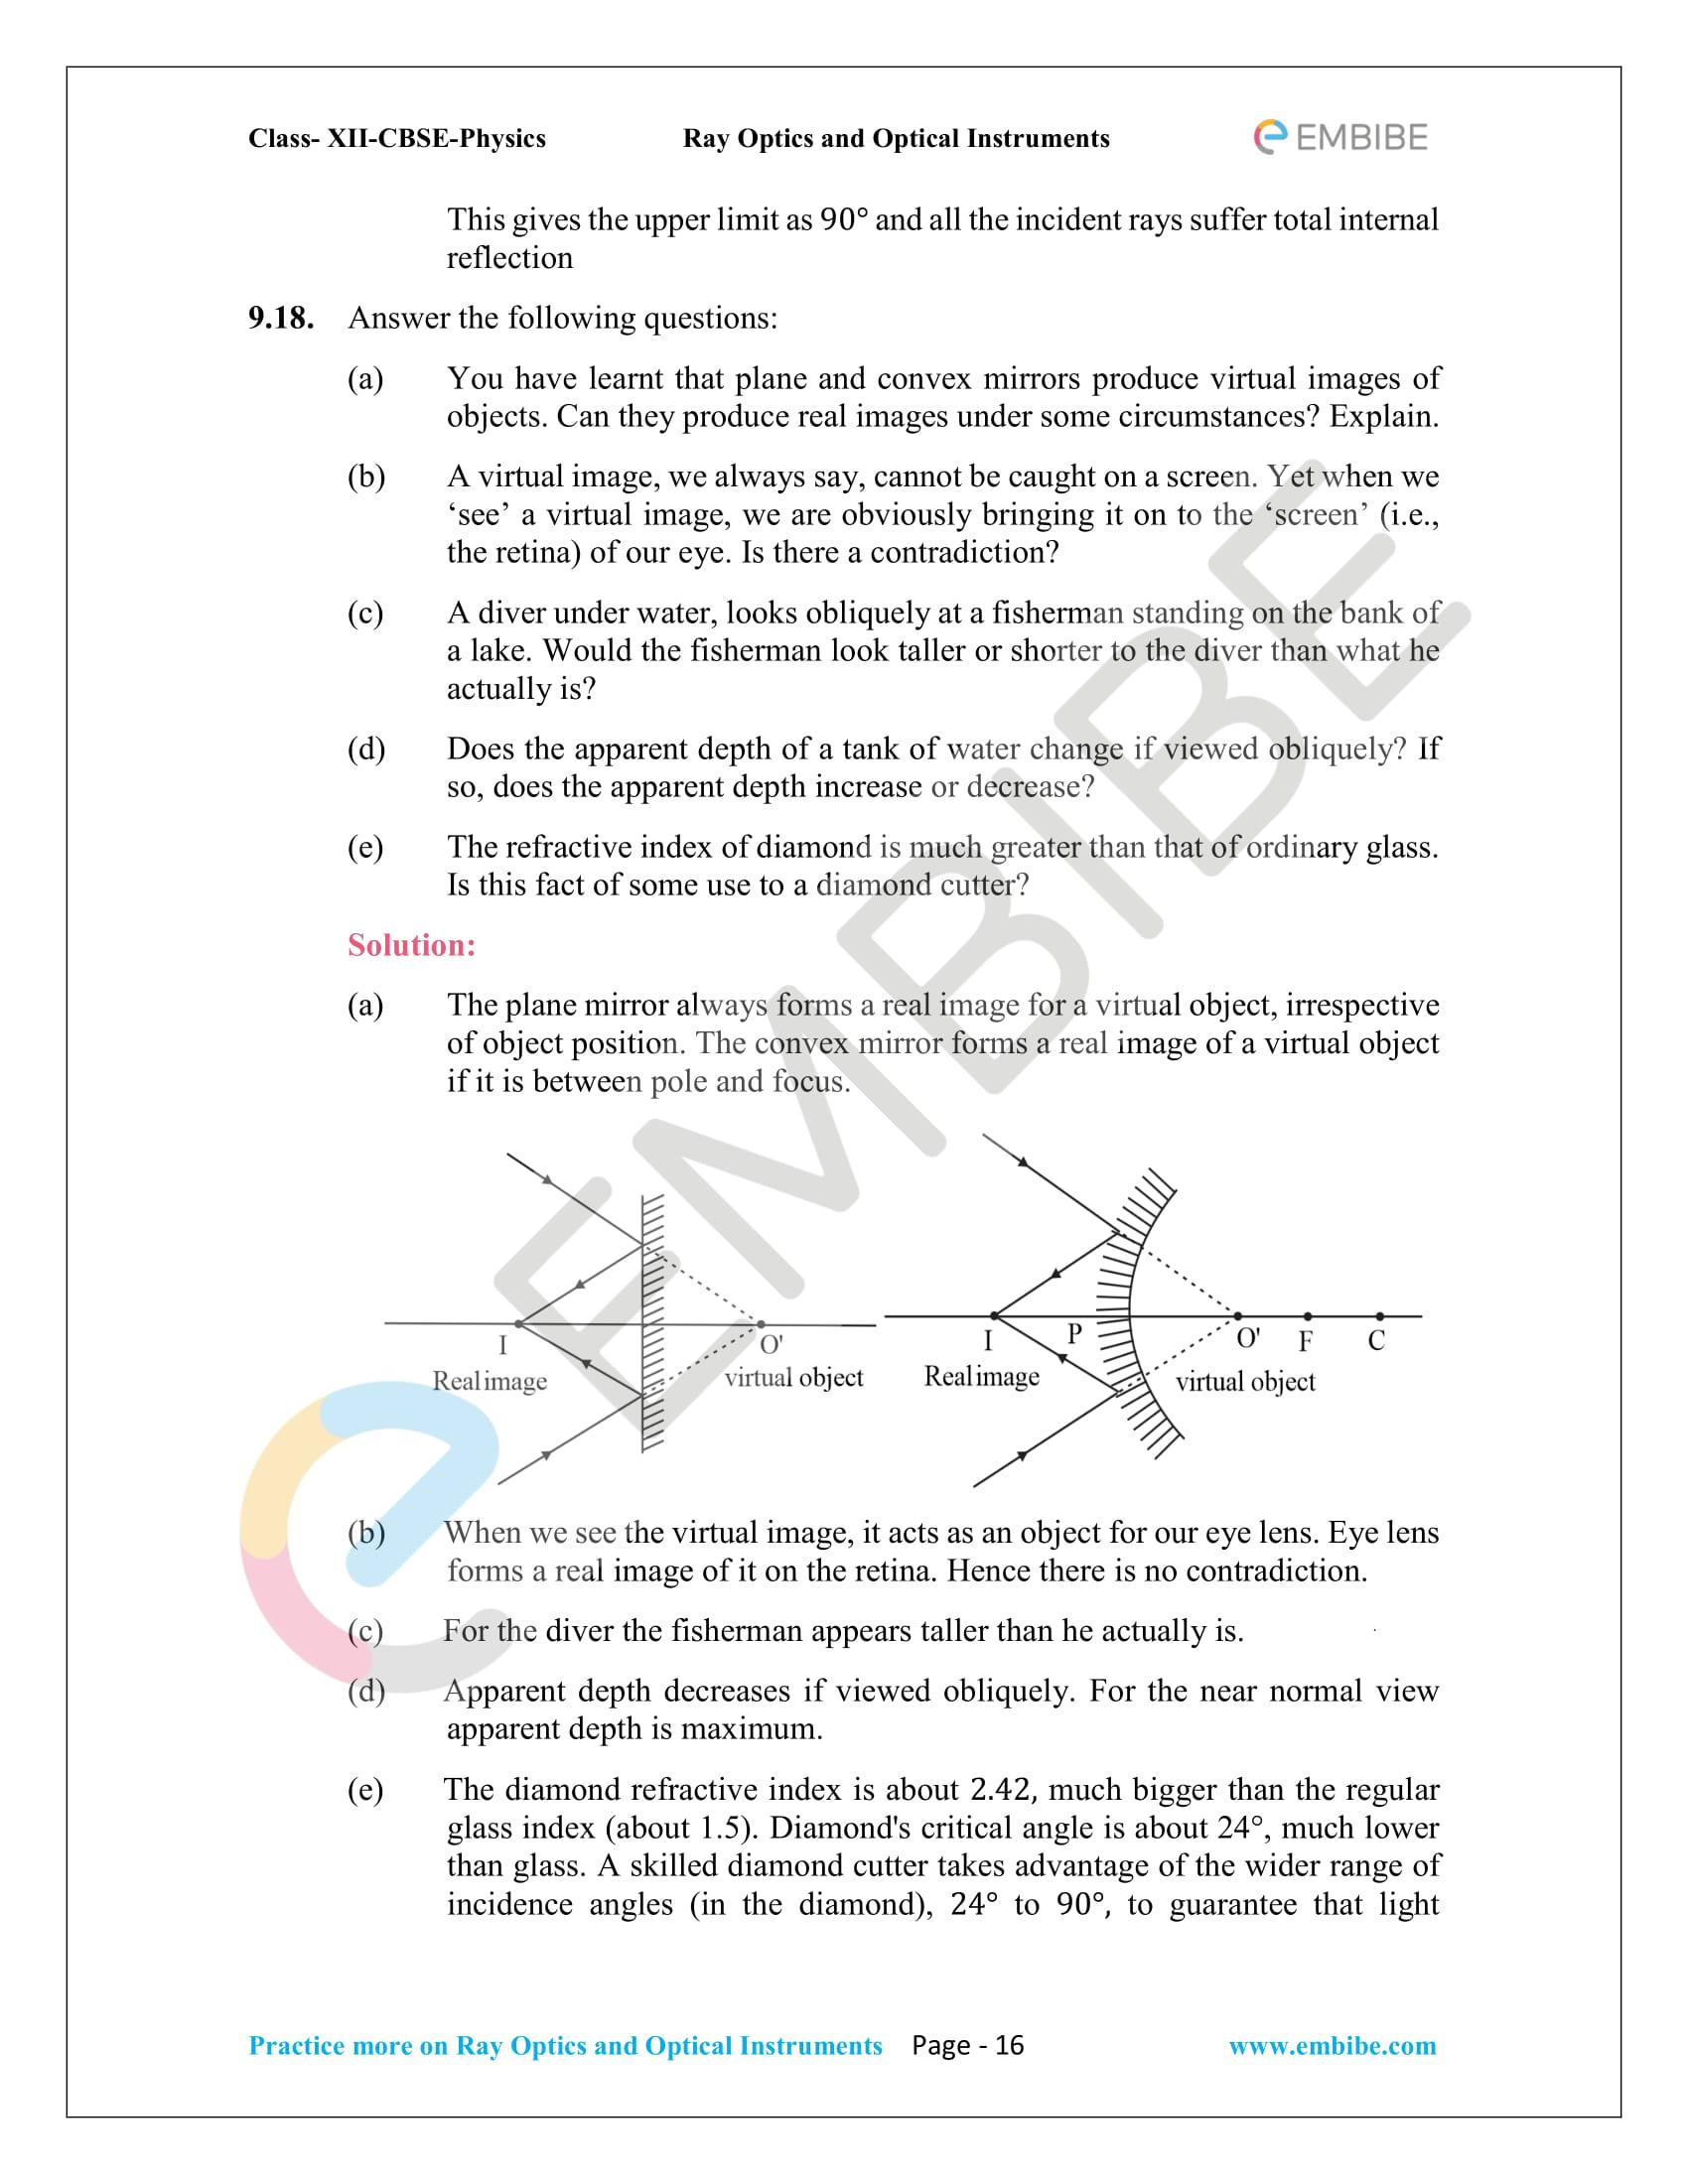 NCERT_Grade 12_Physics_Ch_09_Ray Optics-16